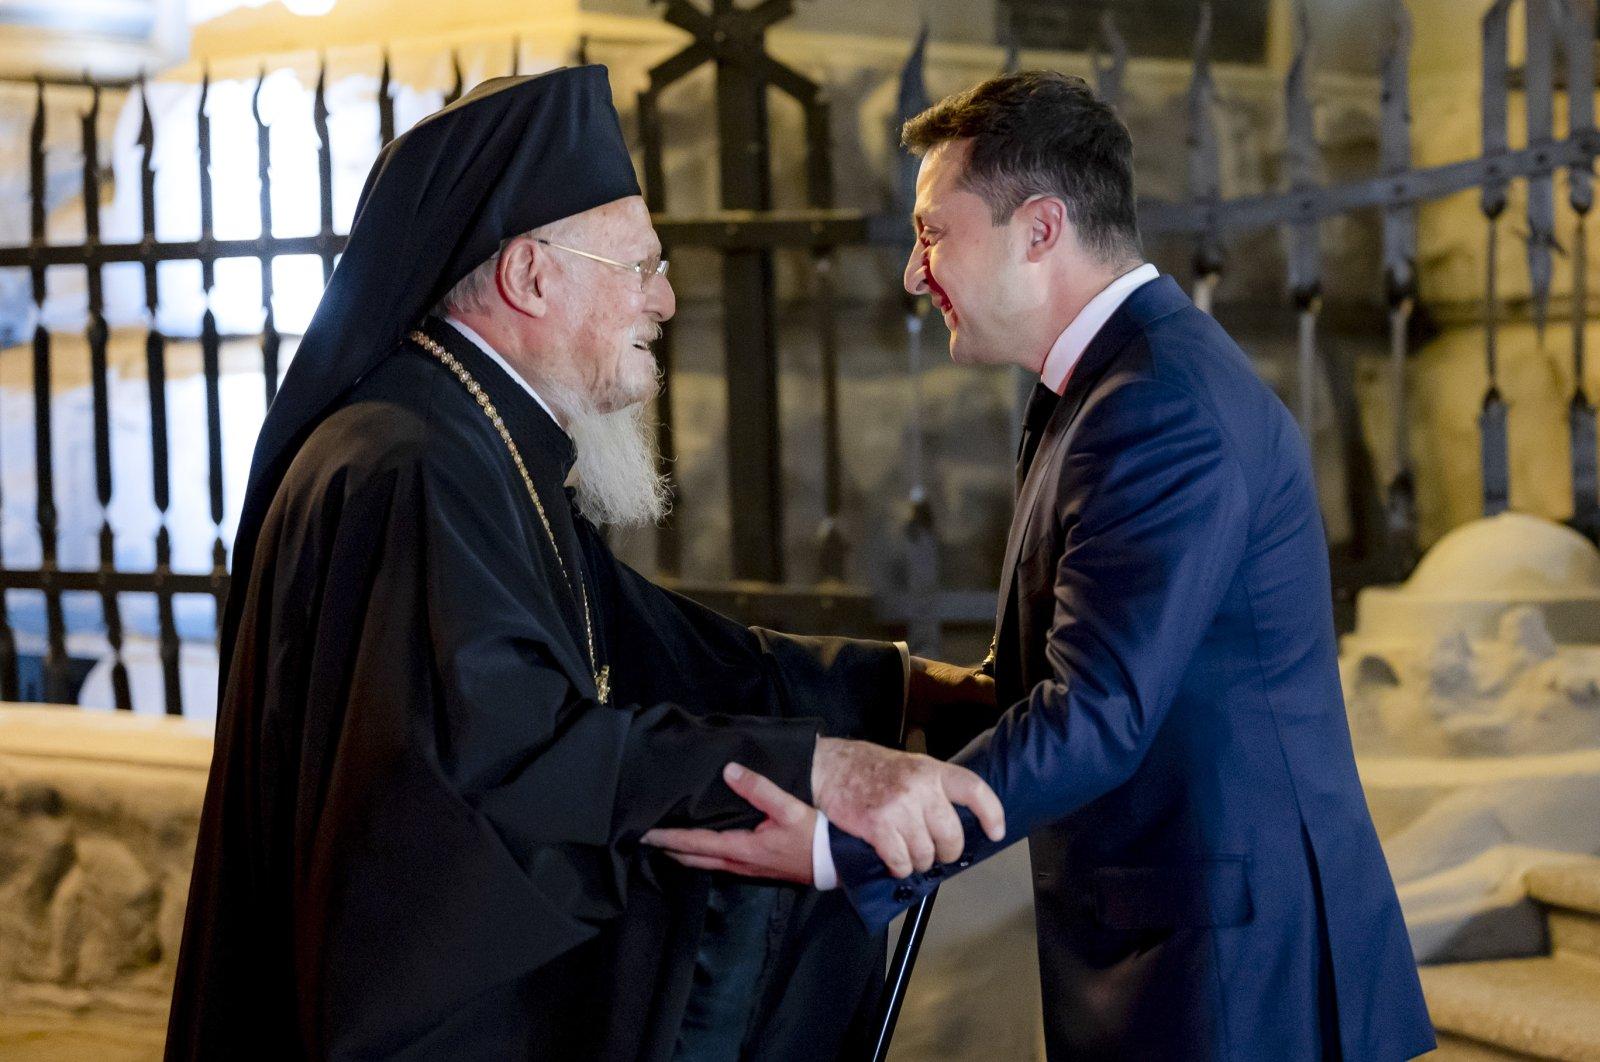 Ukrainian President Volodymyr Zelenskyy (R) greets Fener Greek Orthodox Patriarch Bartholomew I during their meeting in Kyiv, Ukraine, Aug. 21, 2021. (Ukrainian Presidential Press Office via AP)